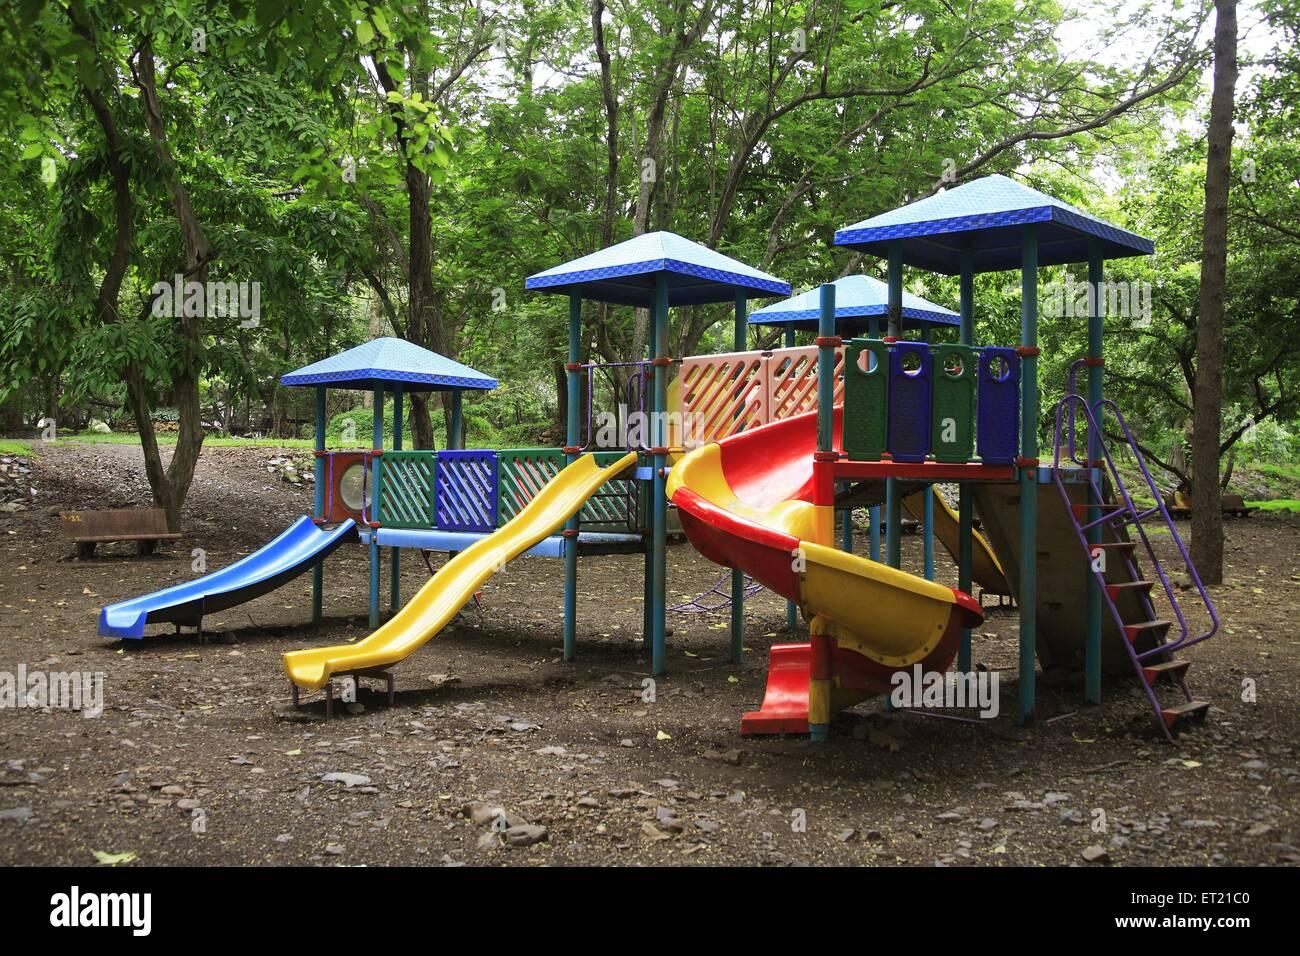 Slide in sanjay gandhi national park ; Borivali ; Bombay Mumbai ; Maharashtra ; India 29 July 2009 - Stock Image